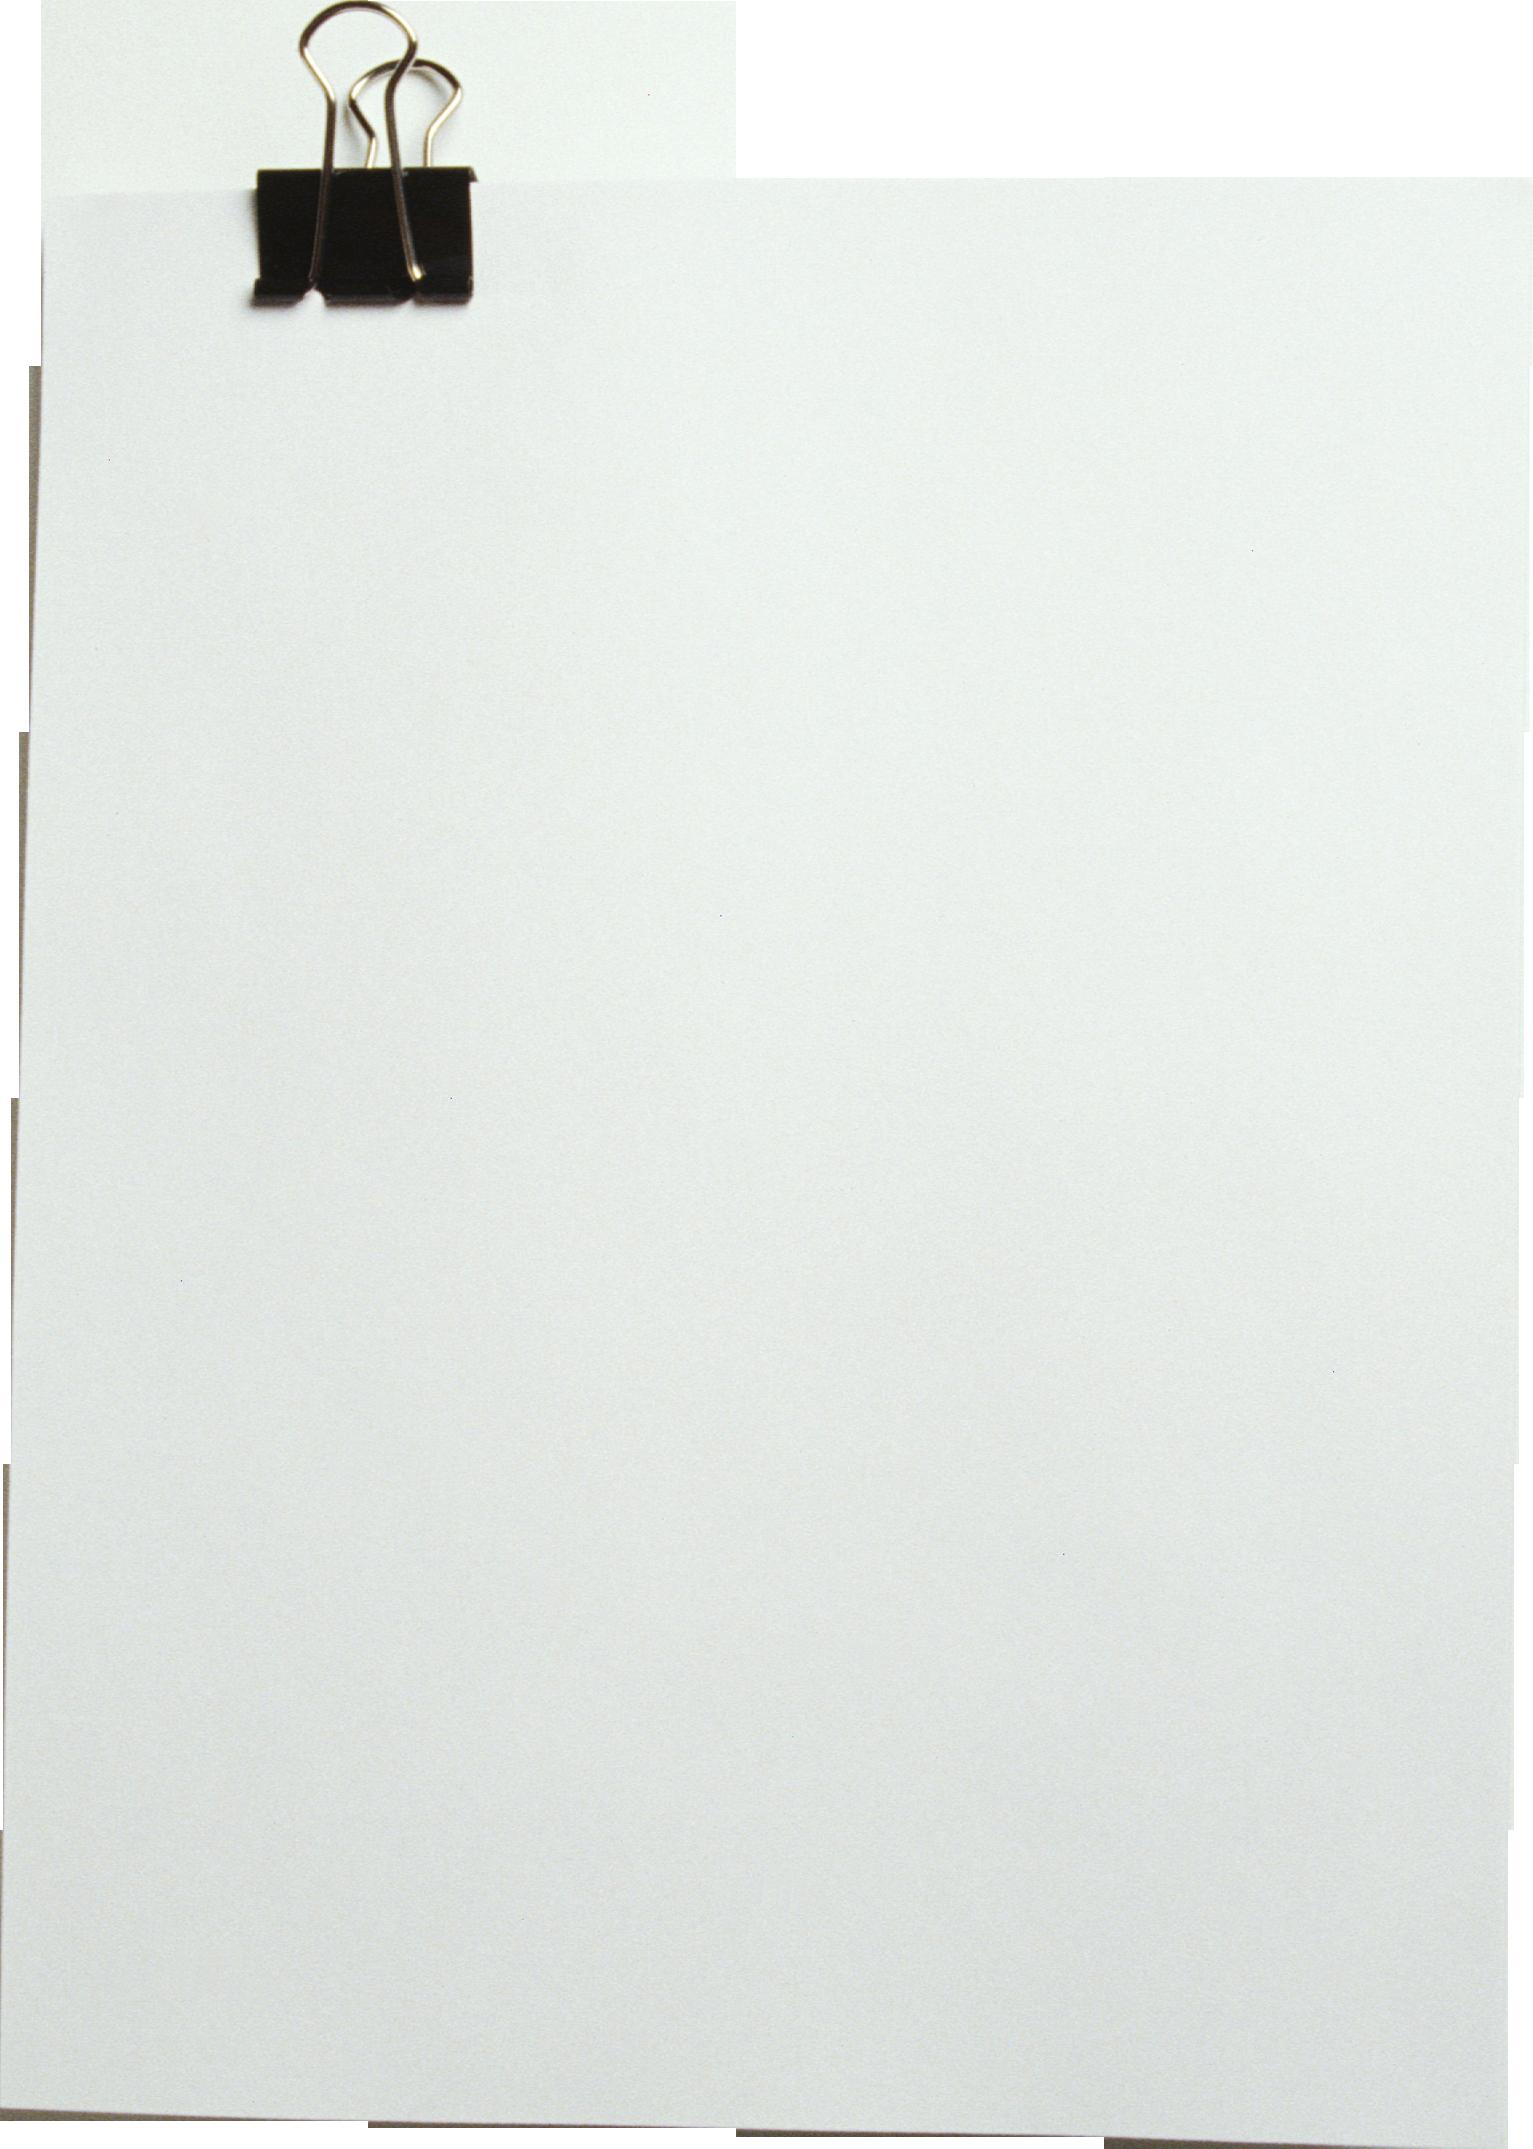 Paper Sheet PNG - 13452